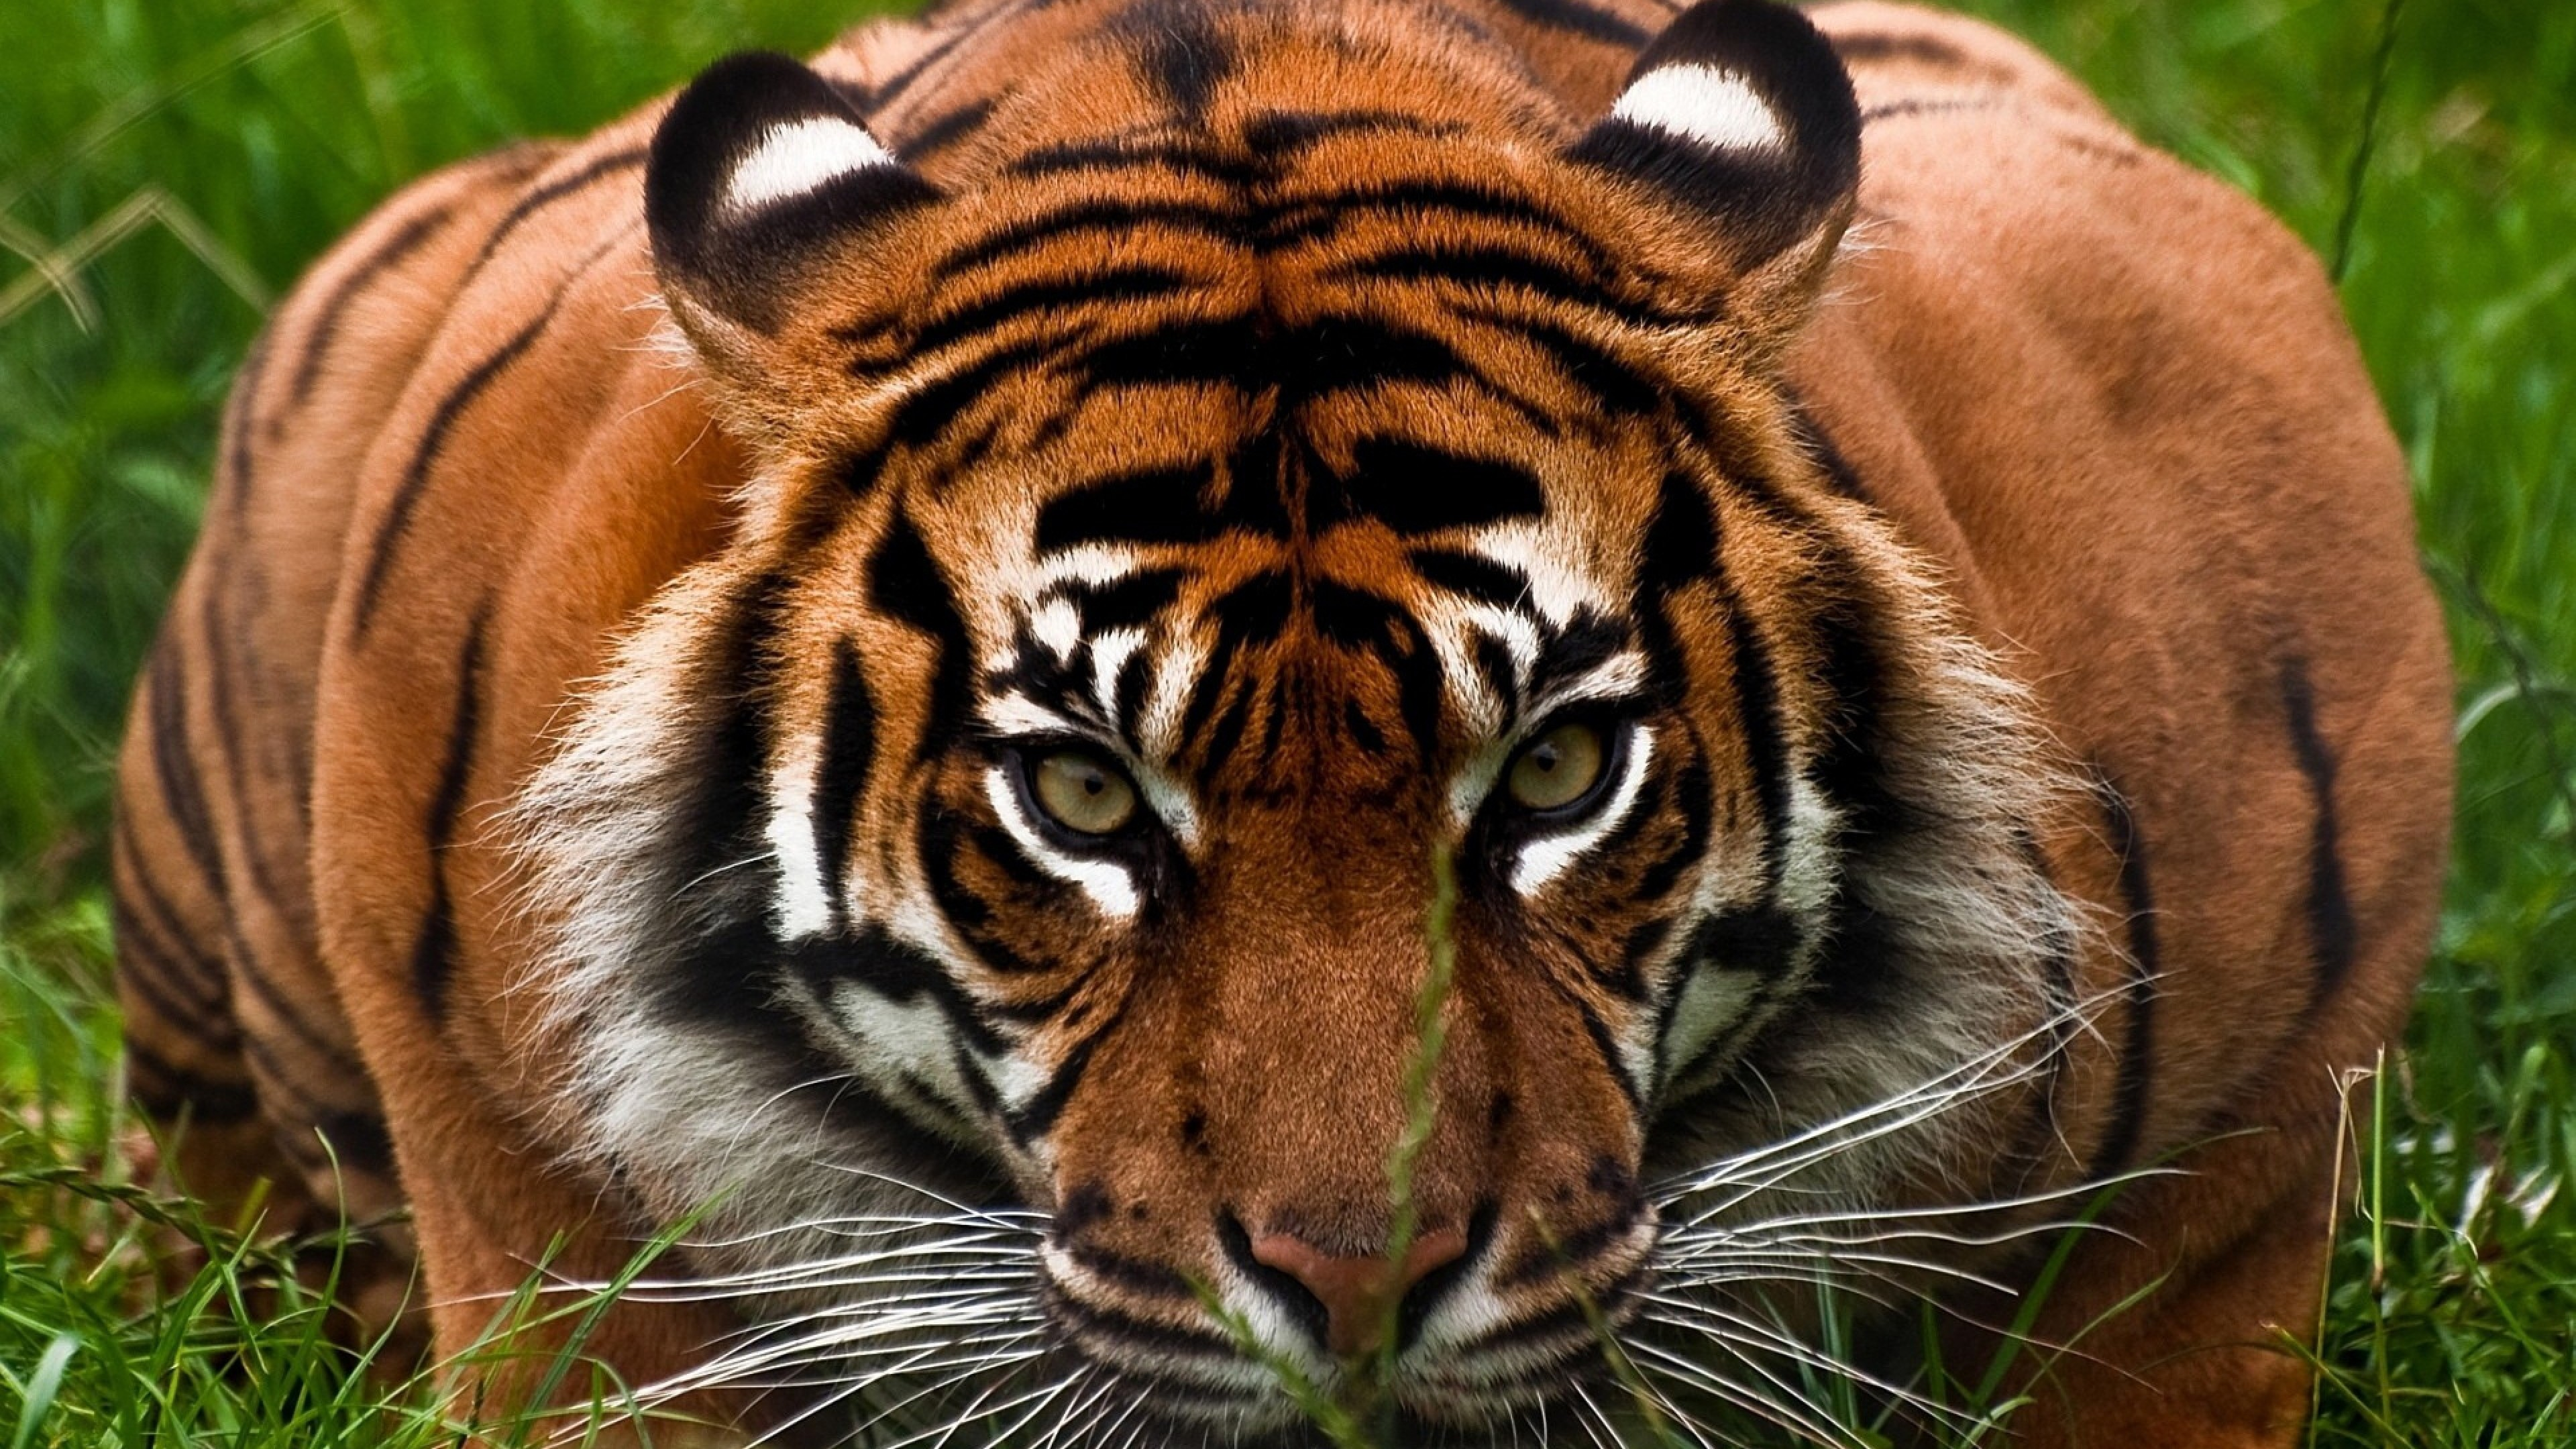 Tiger Face Wallpaper ·① WallpaperTag